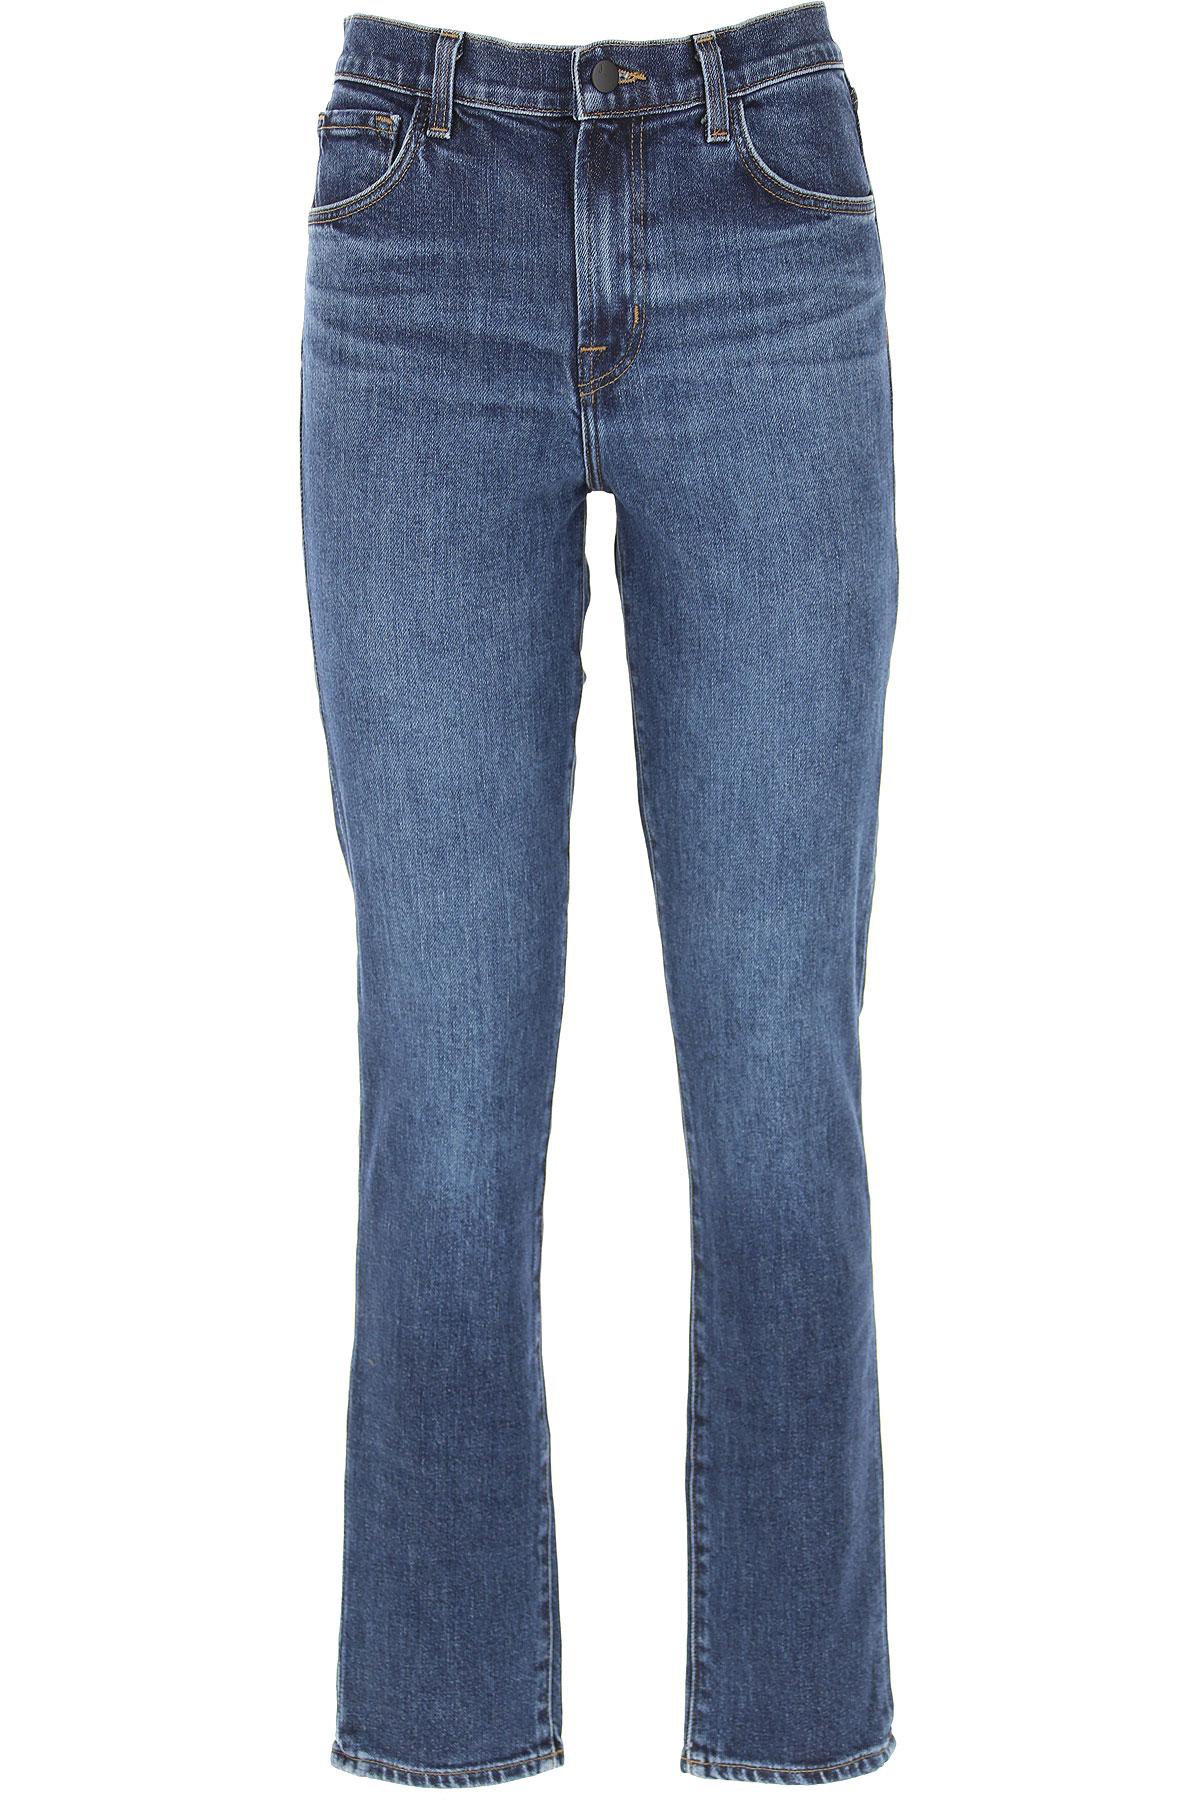 J Brand Jeans On Sale, Denim Blue, Cotton, 2019, 28 29 30